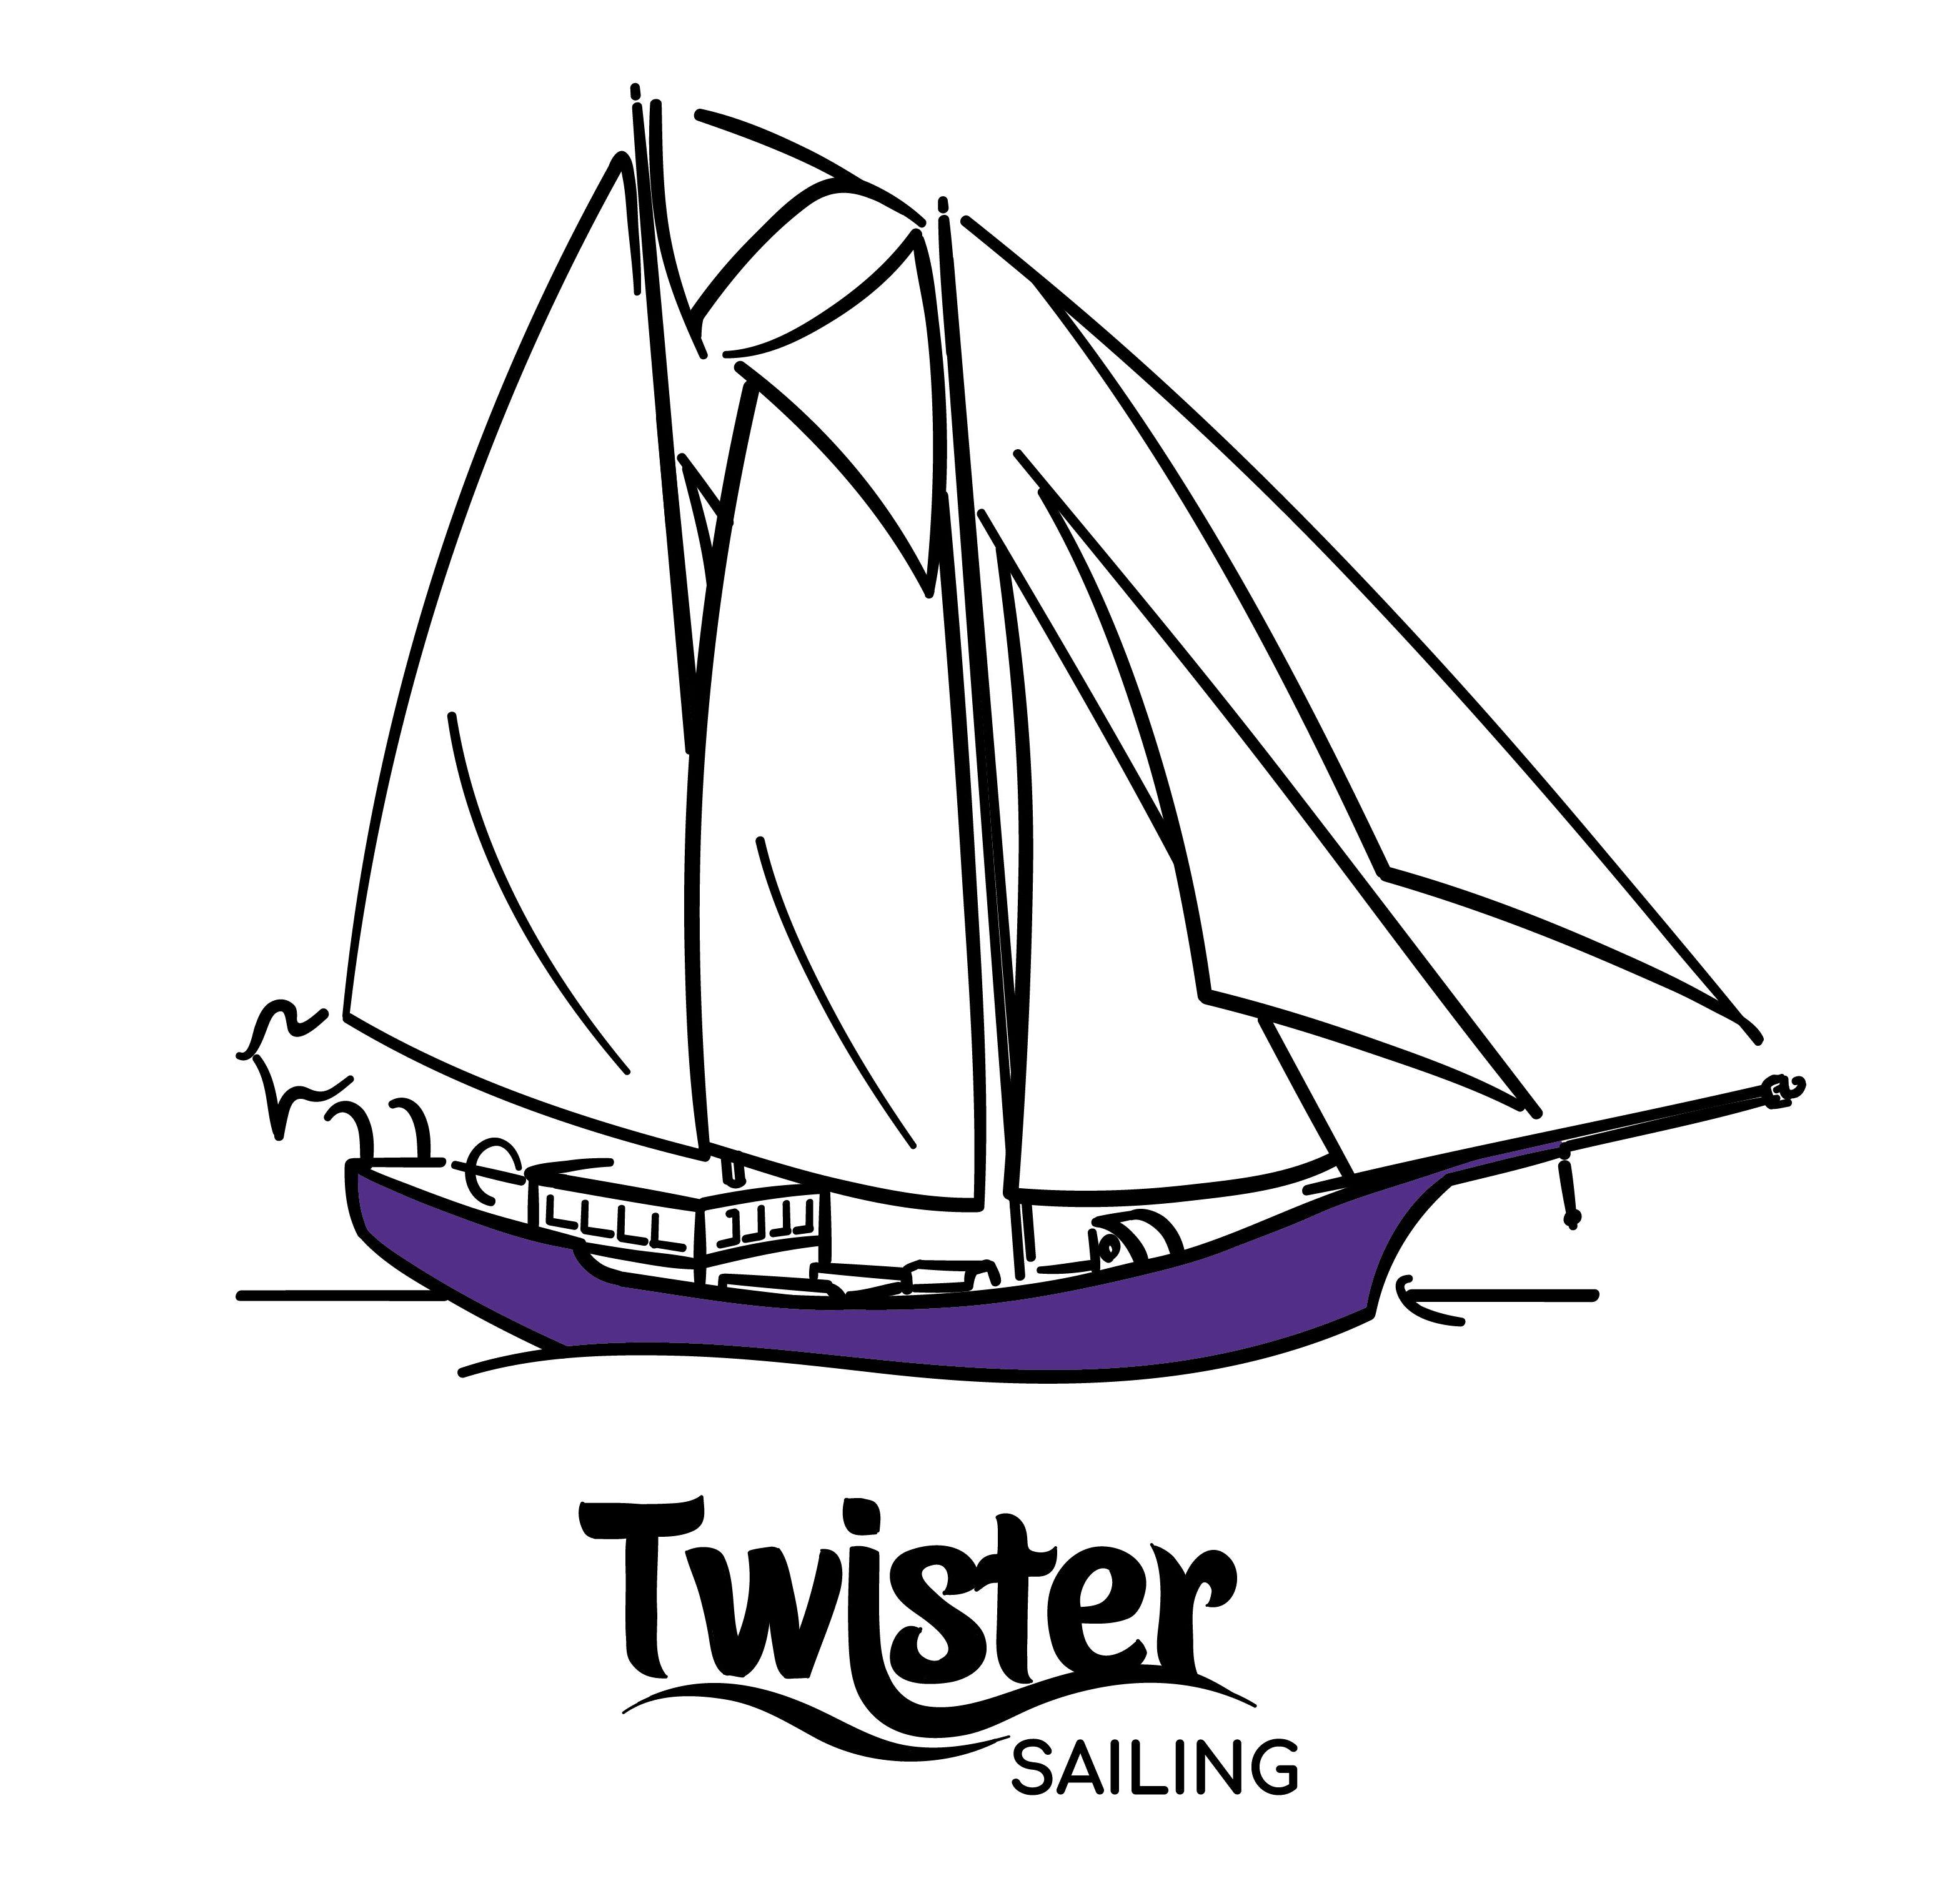 Tallship Twister